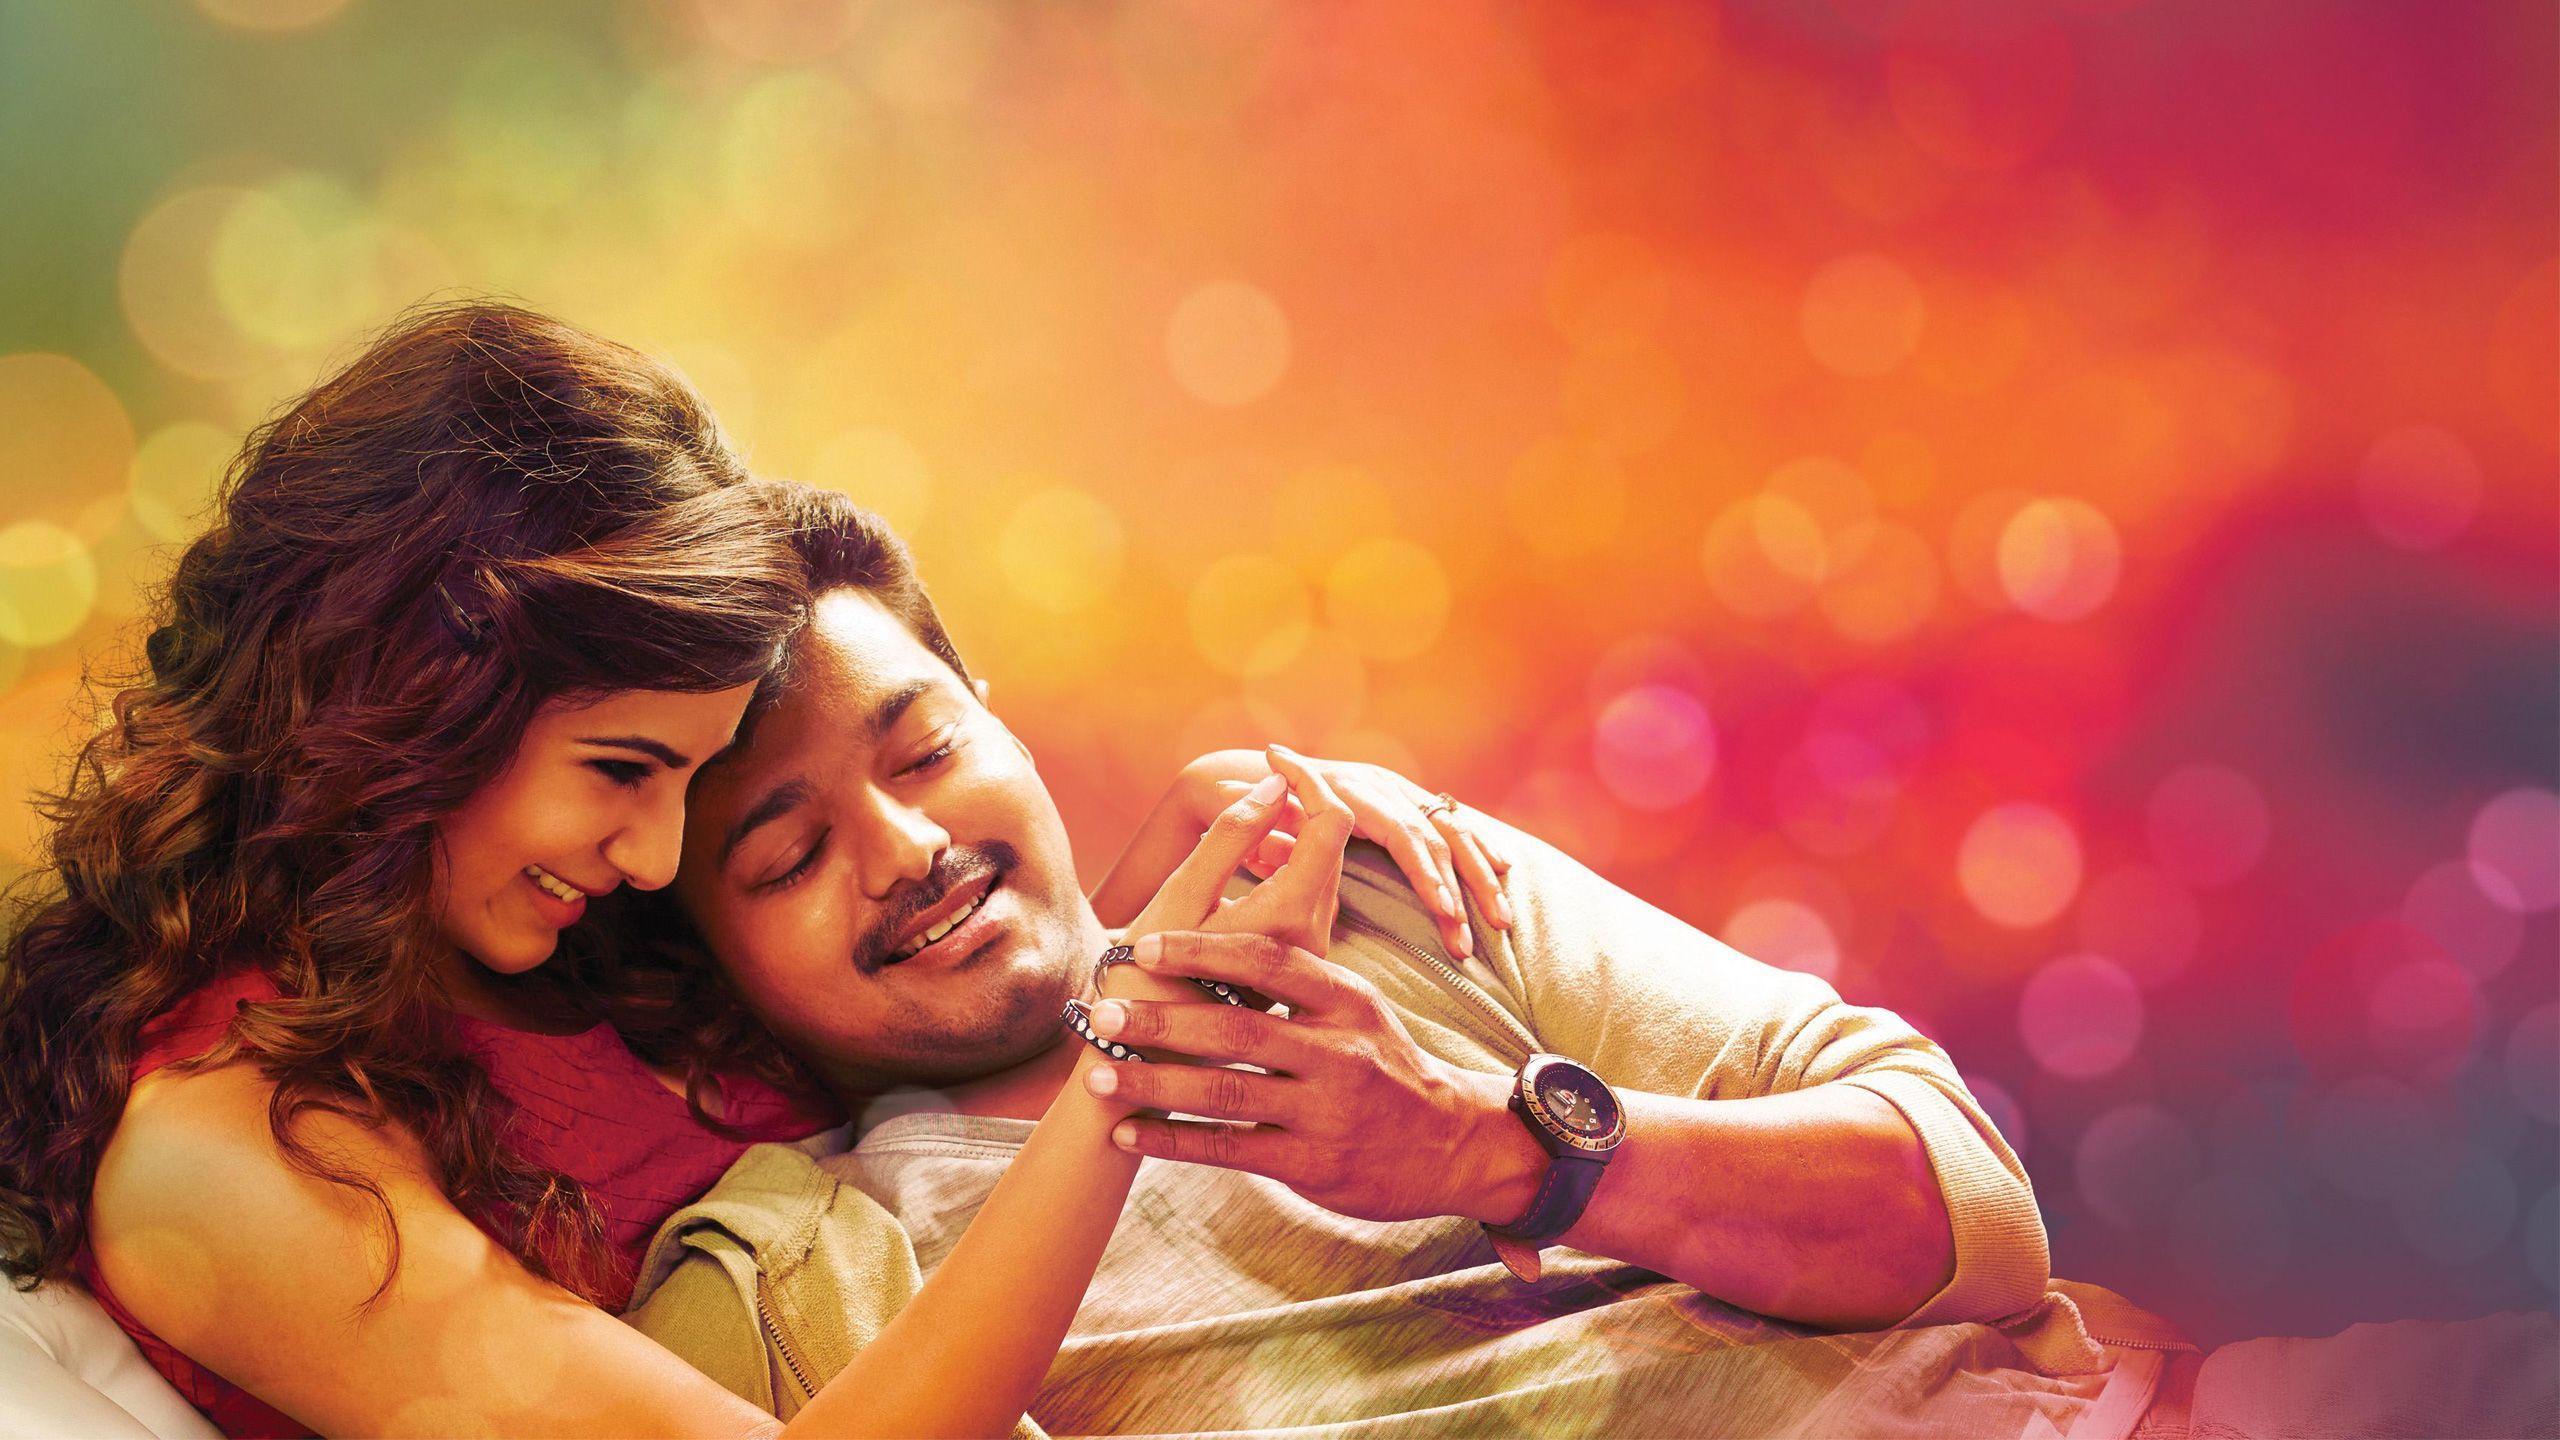 Vijay Love Wallpapers Top Free Vijay Love Backgrounds Wallpaperaccess